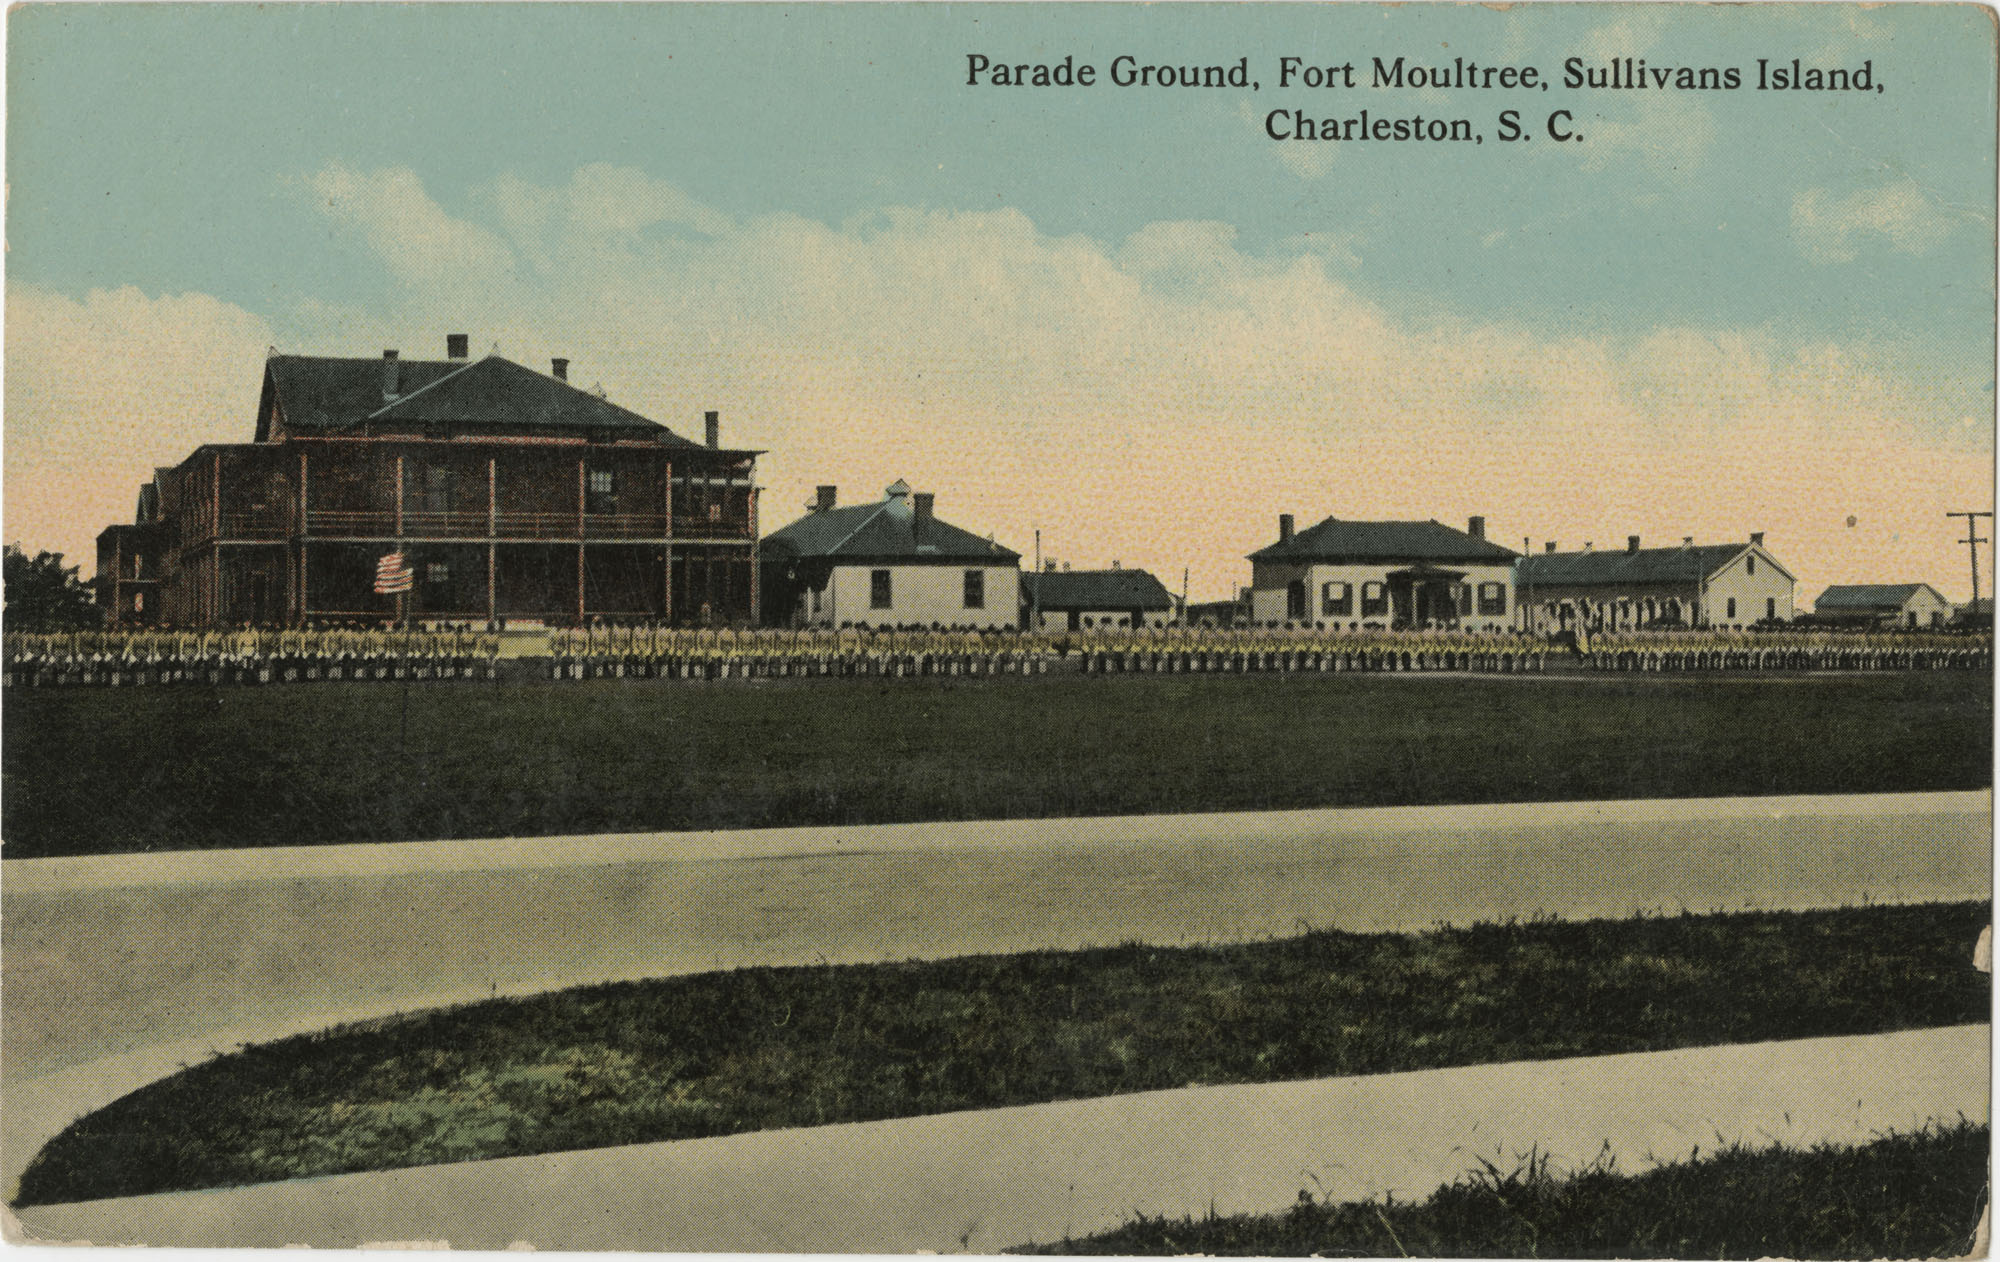 Parade Ground, Fort Moultrie, Sullivans Island, Charleston, S.C.